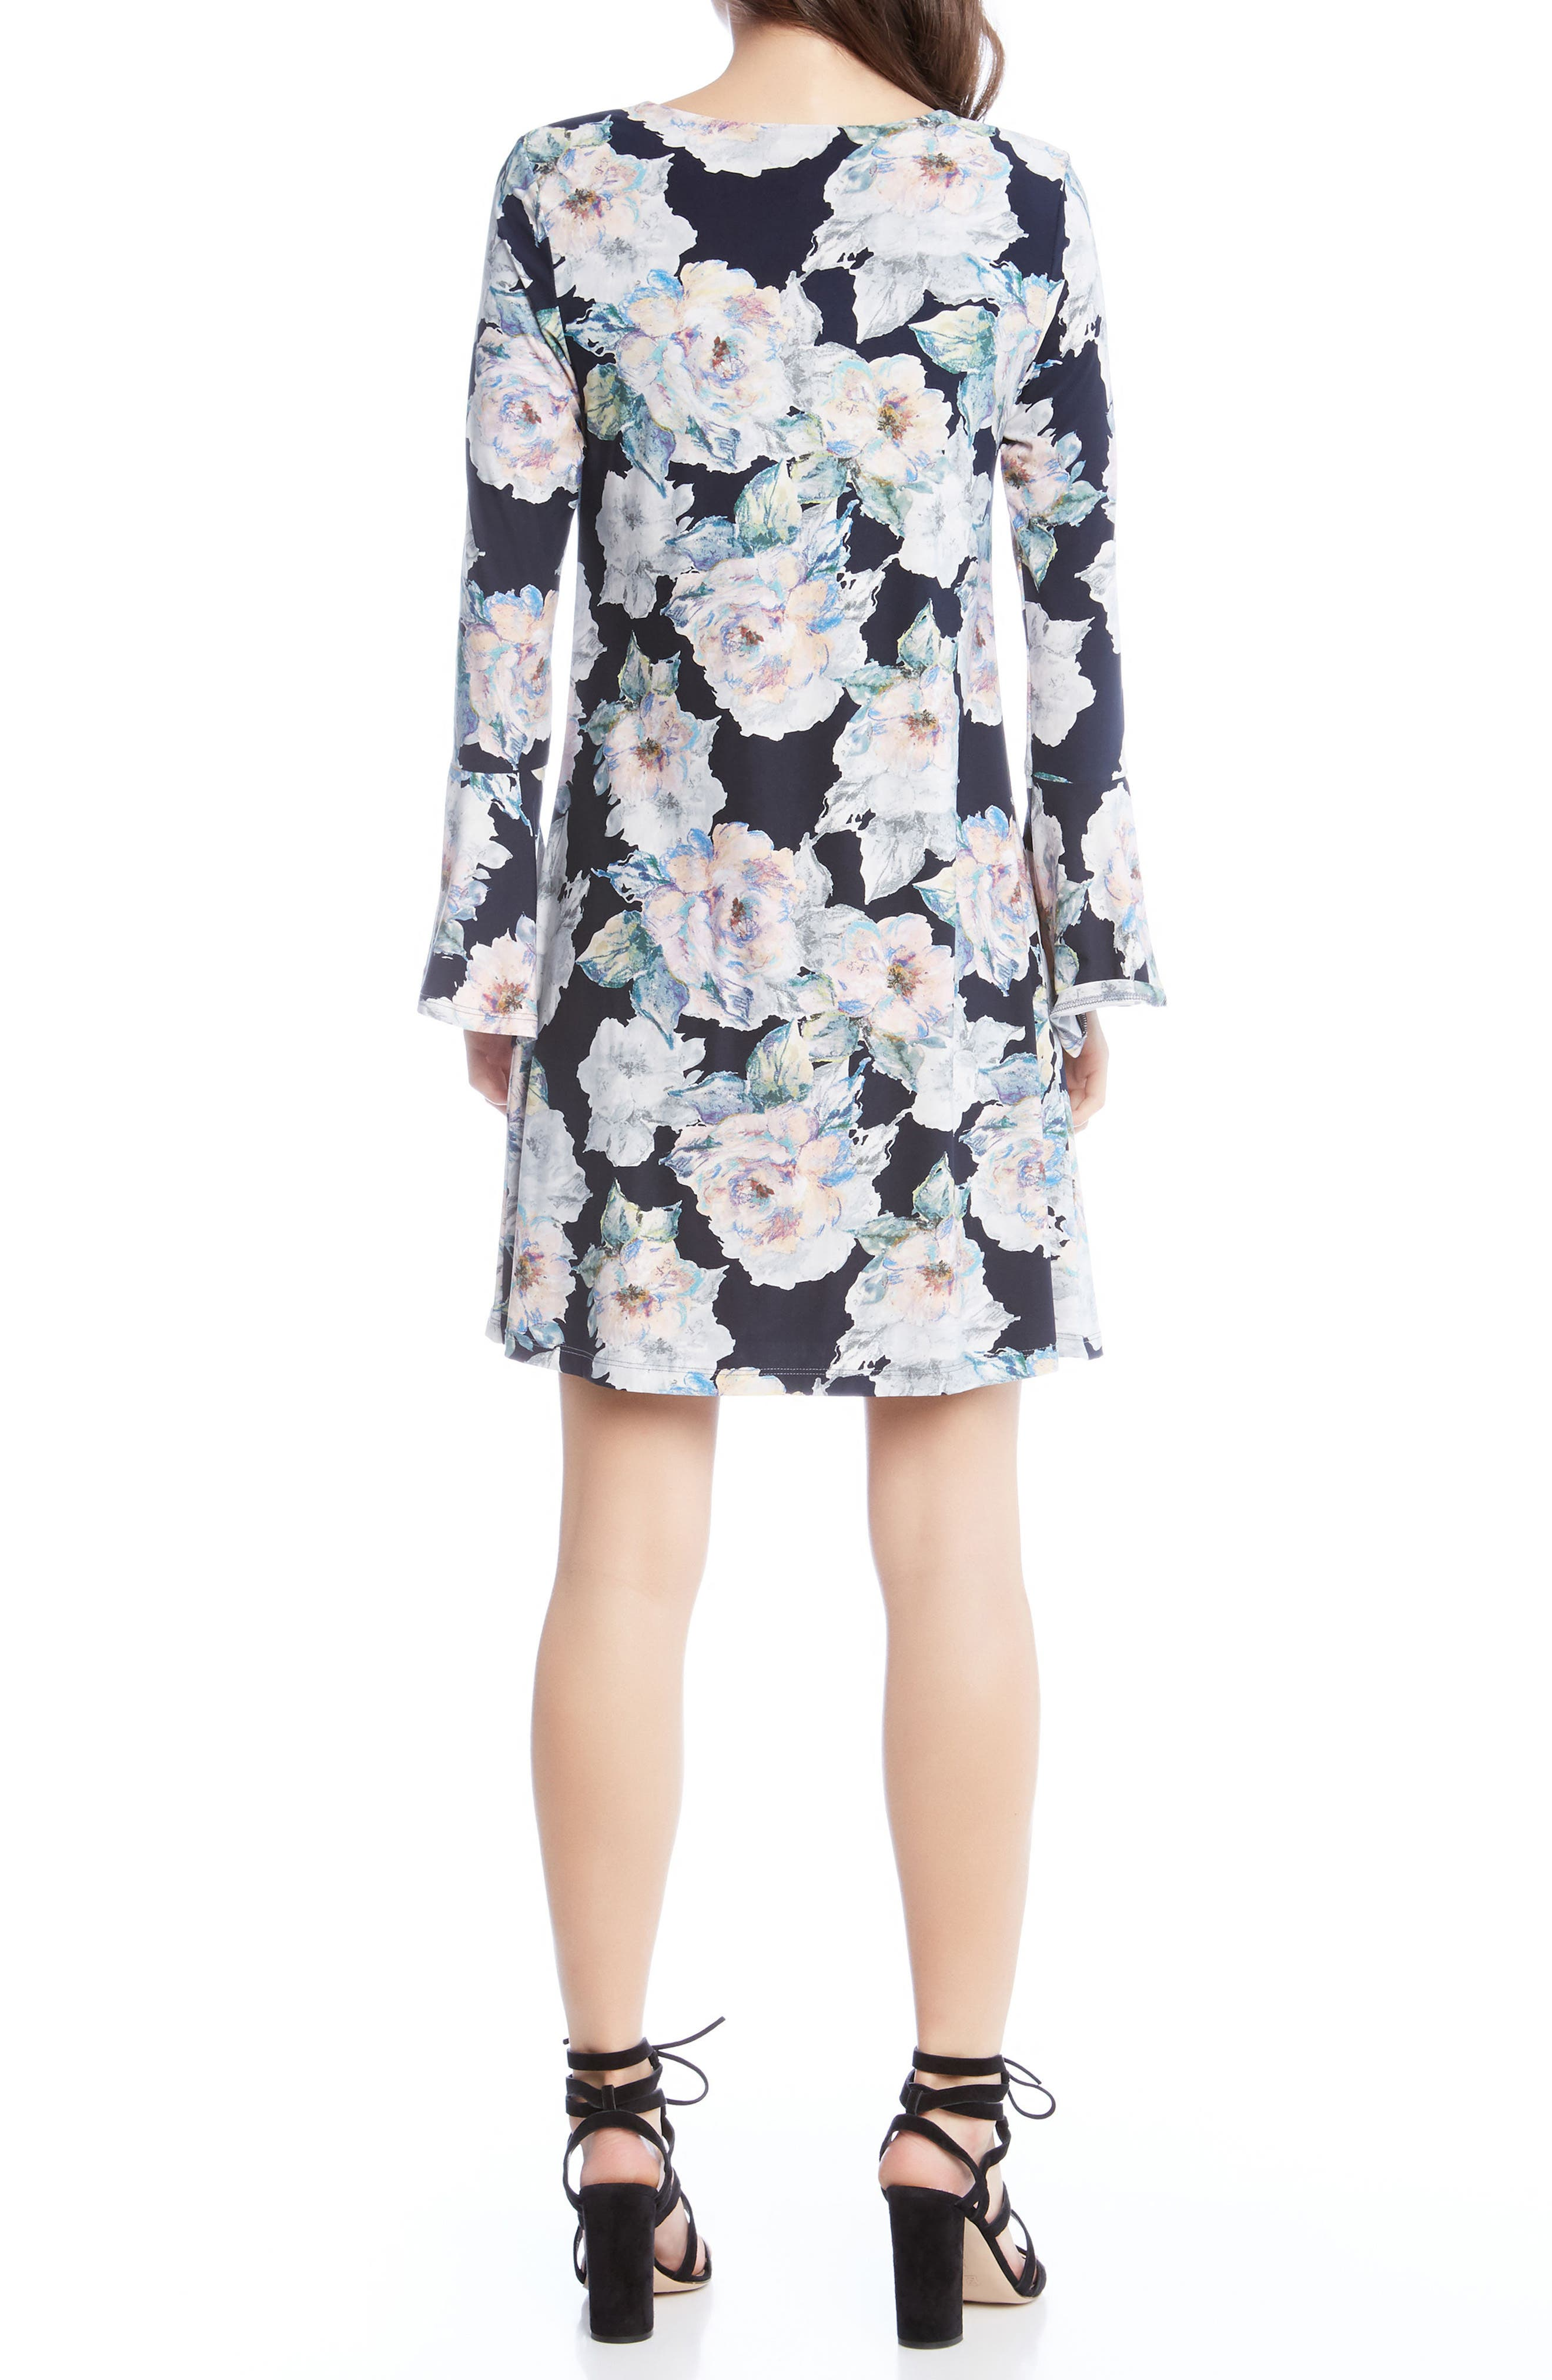 Taylor Bell Sleeve Dress,                             Alternate thumbnail 2, color,                             001